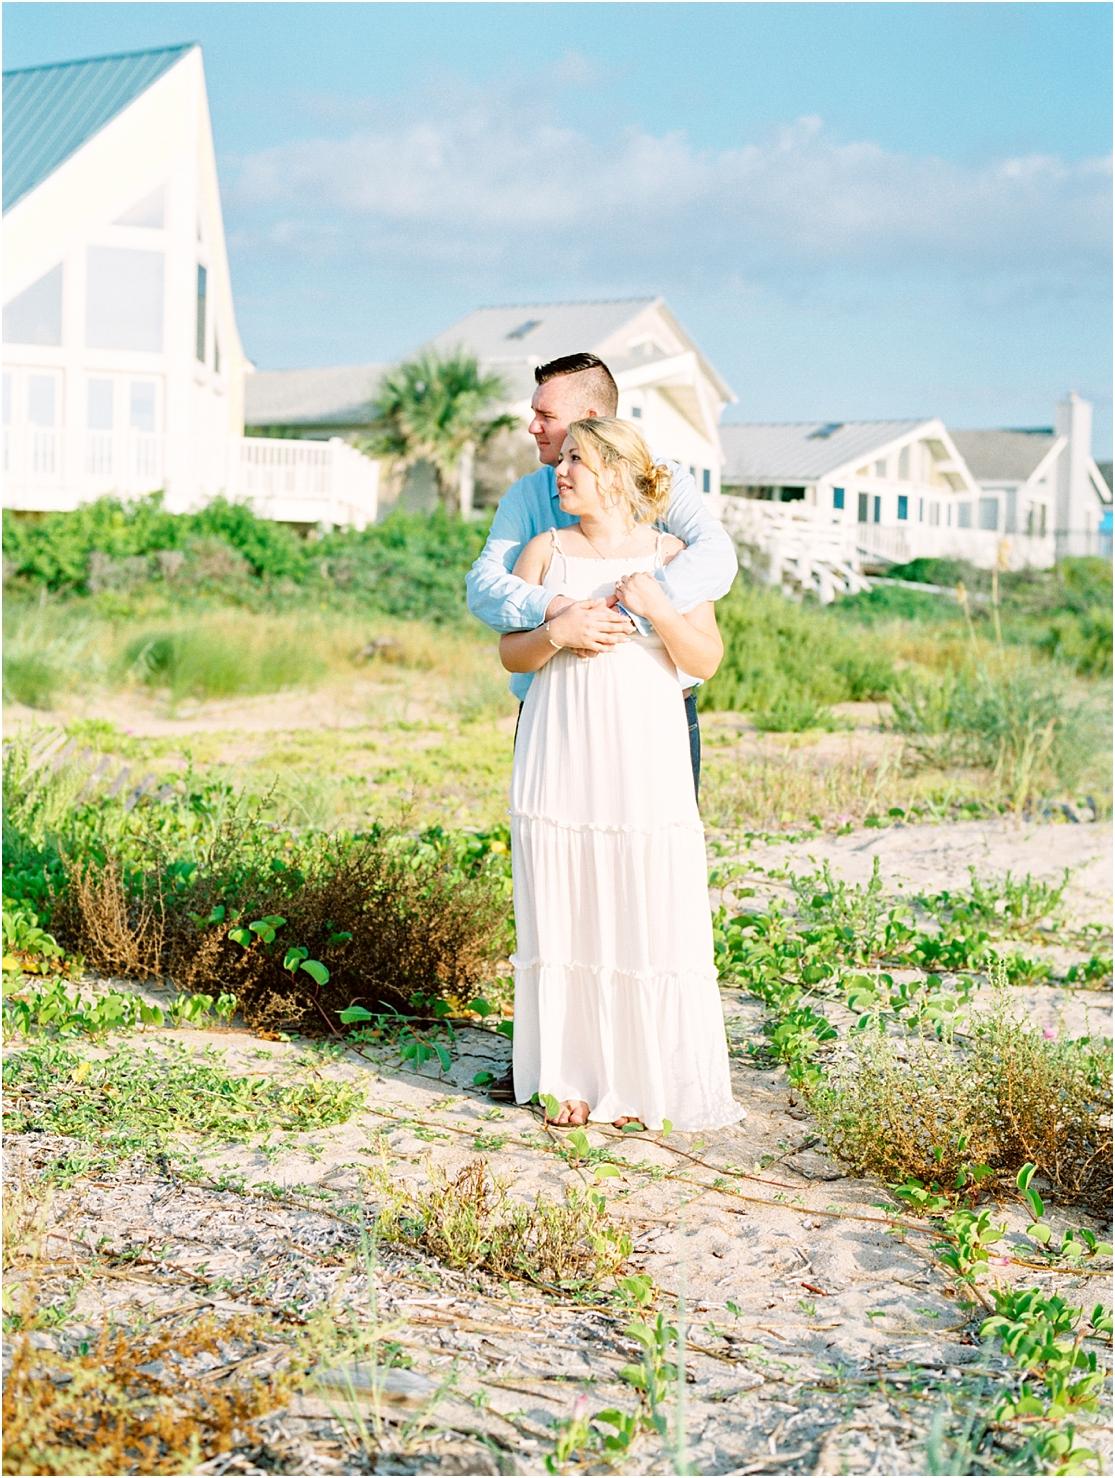 Lisa Silva Photography- Ponte Vedra Beach, St. Augustine and Jacksonville, Florida Fine Art Film Wedding Photography- Sunrise Engagement Session at  Vilano Beach_0025.jpg